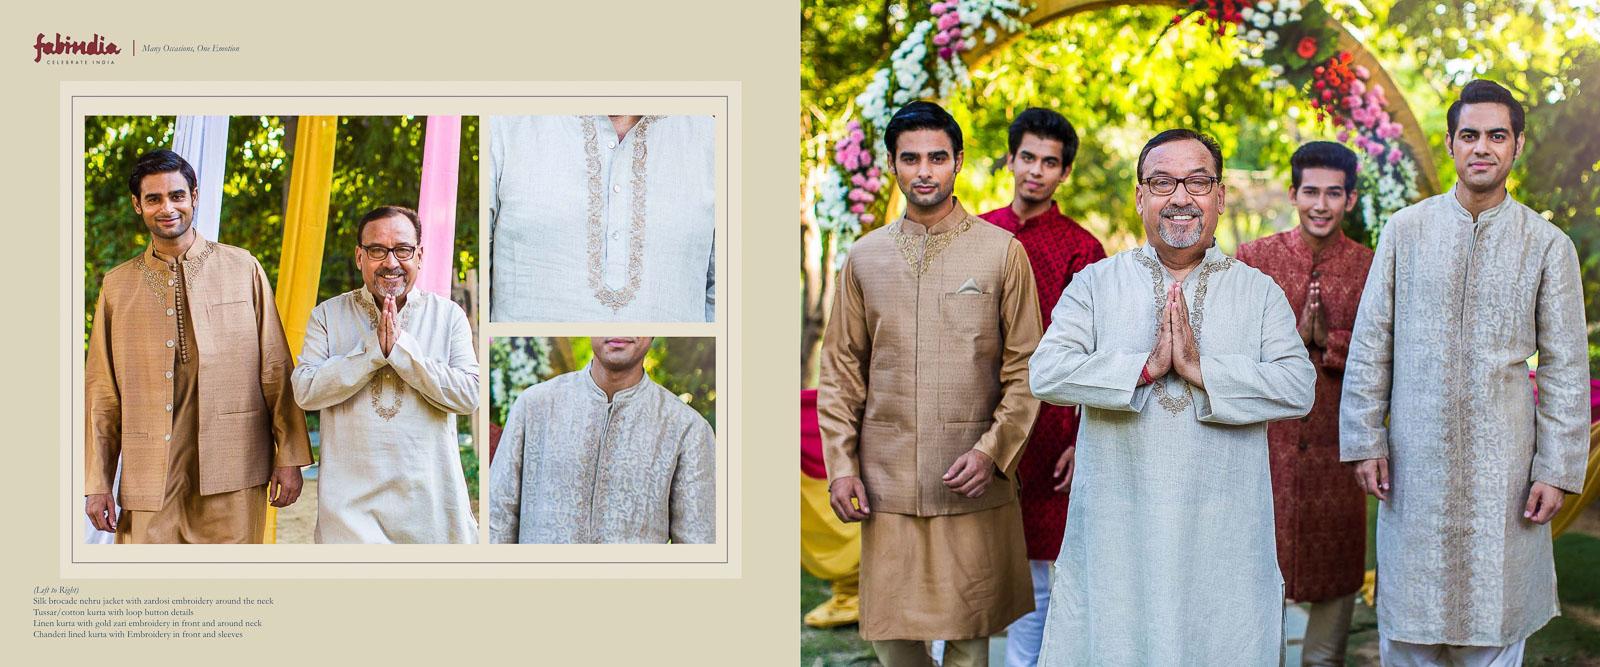 Fashion-Photographer-Fabindia-Ethnic-RamitBatra_06